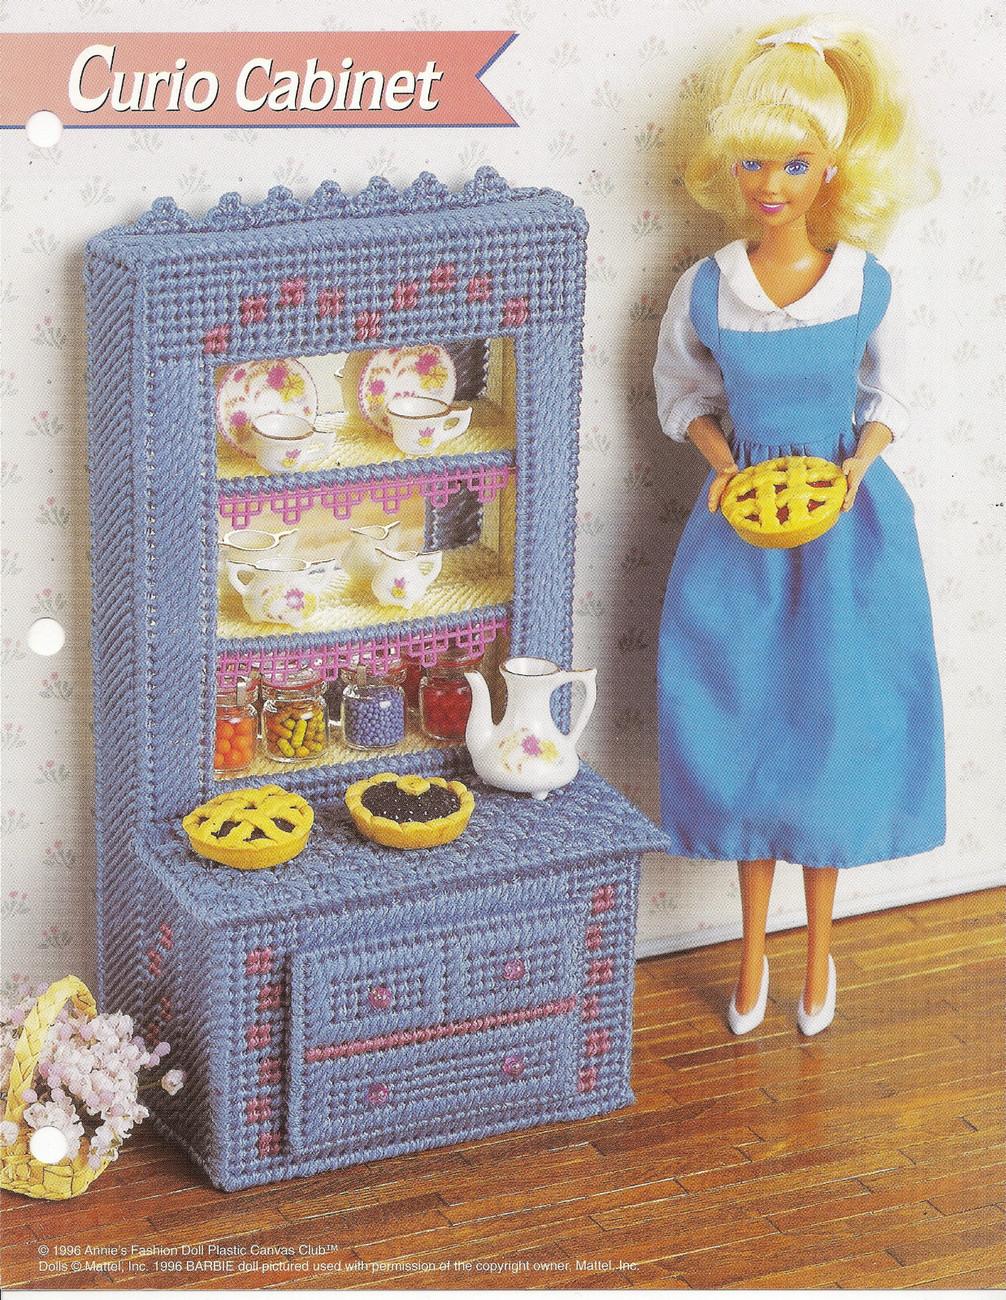 Curio Cabinet Annies Attic Fashion Doll Plastic Canvas